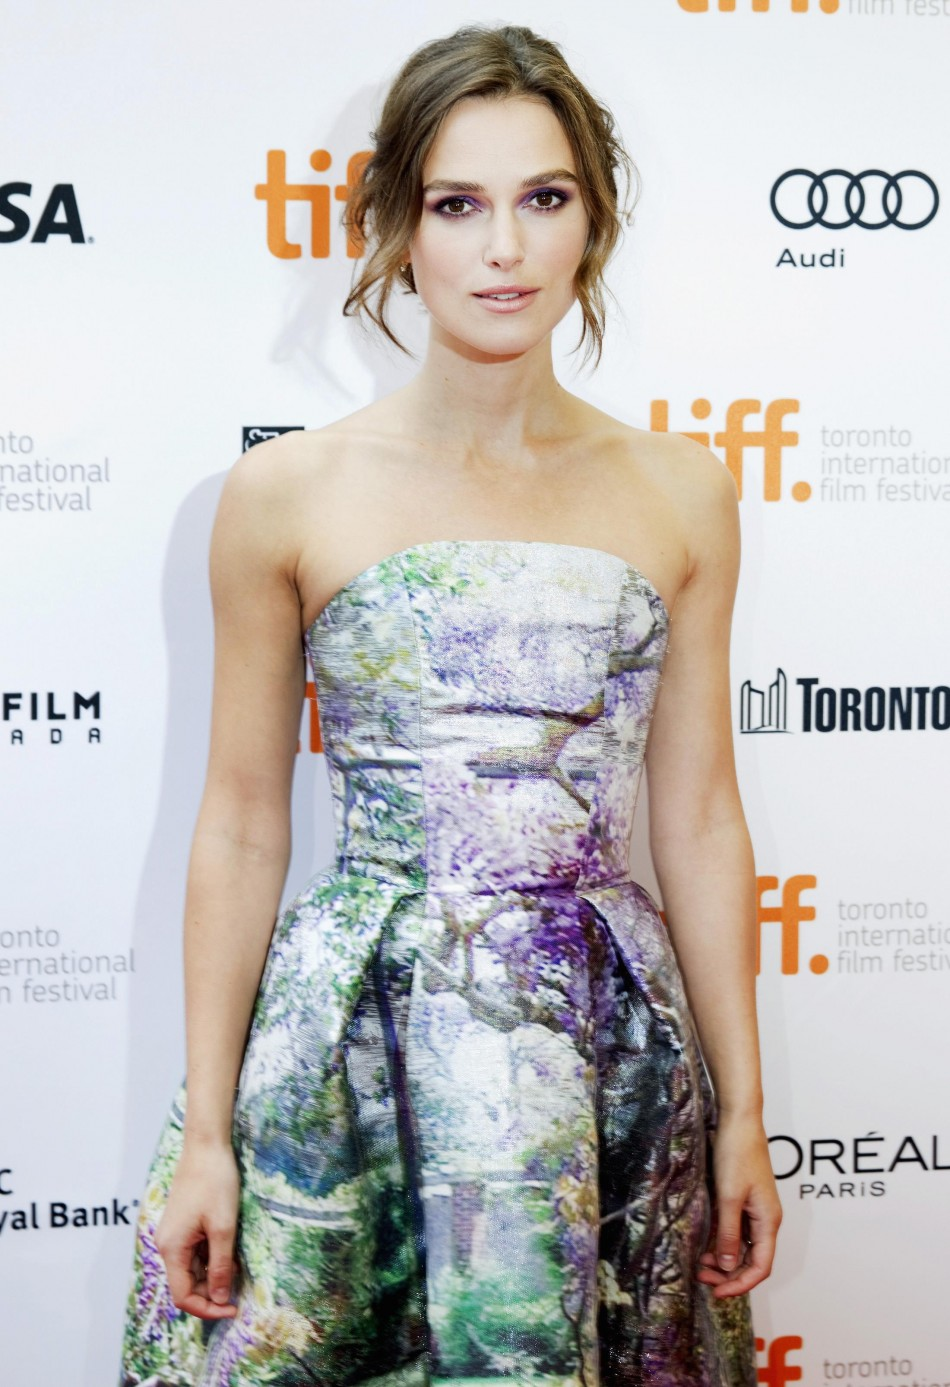 Keira Knightley Topless Pride  Prejudice Actress Strips -2141